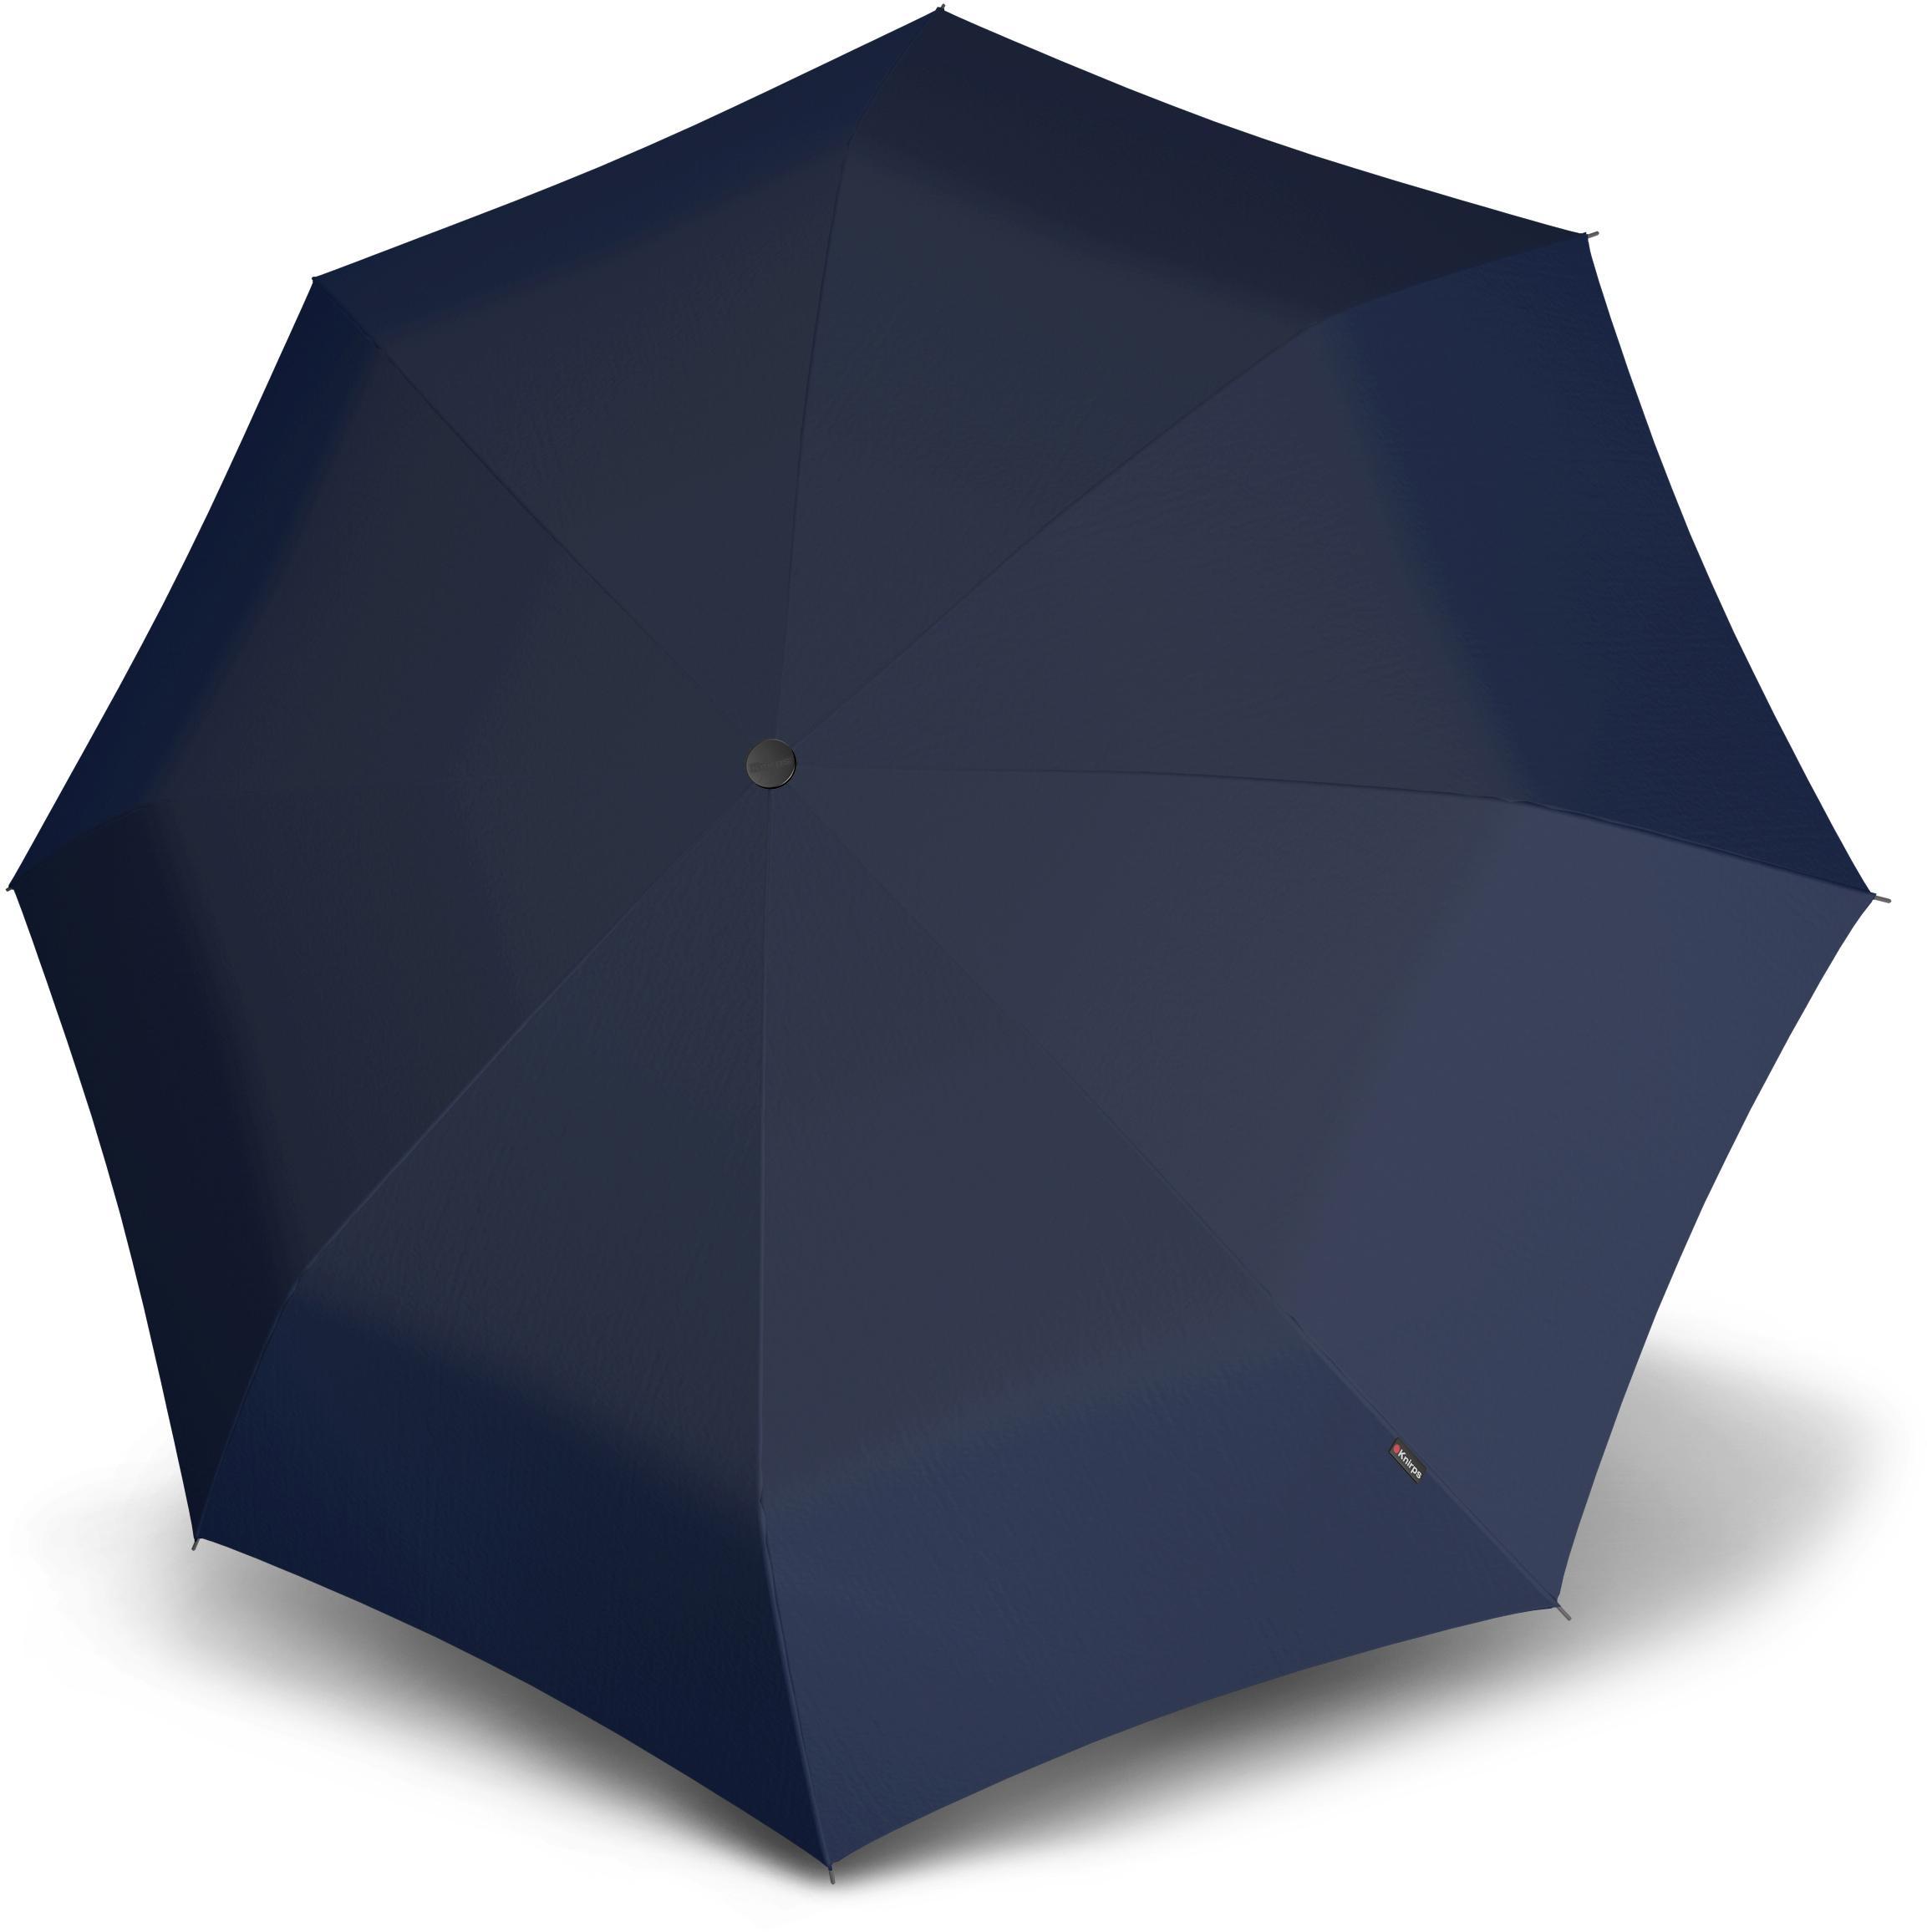 Knirps Stockregenschirm ´´T703 Stick Automatic´´   Accessoires > Regenschirme > Sonstige Regenschirme   Blau   Knirps